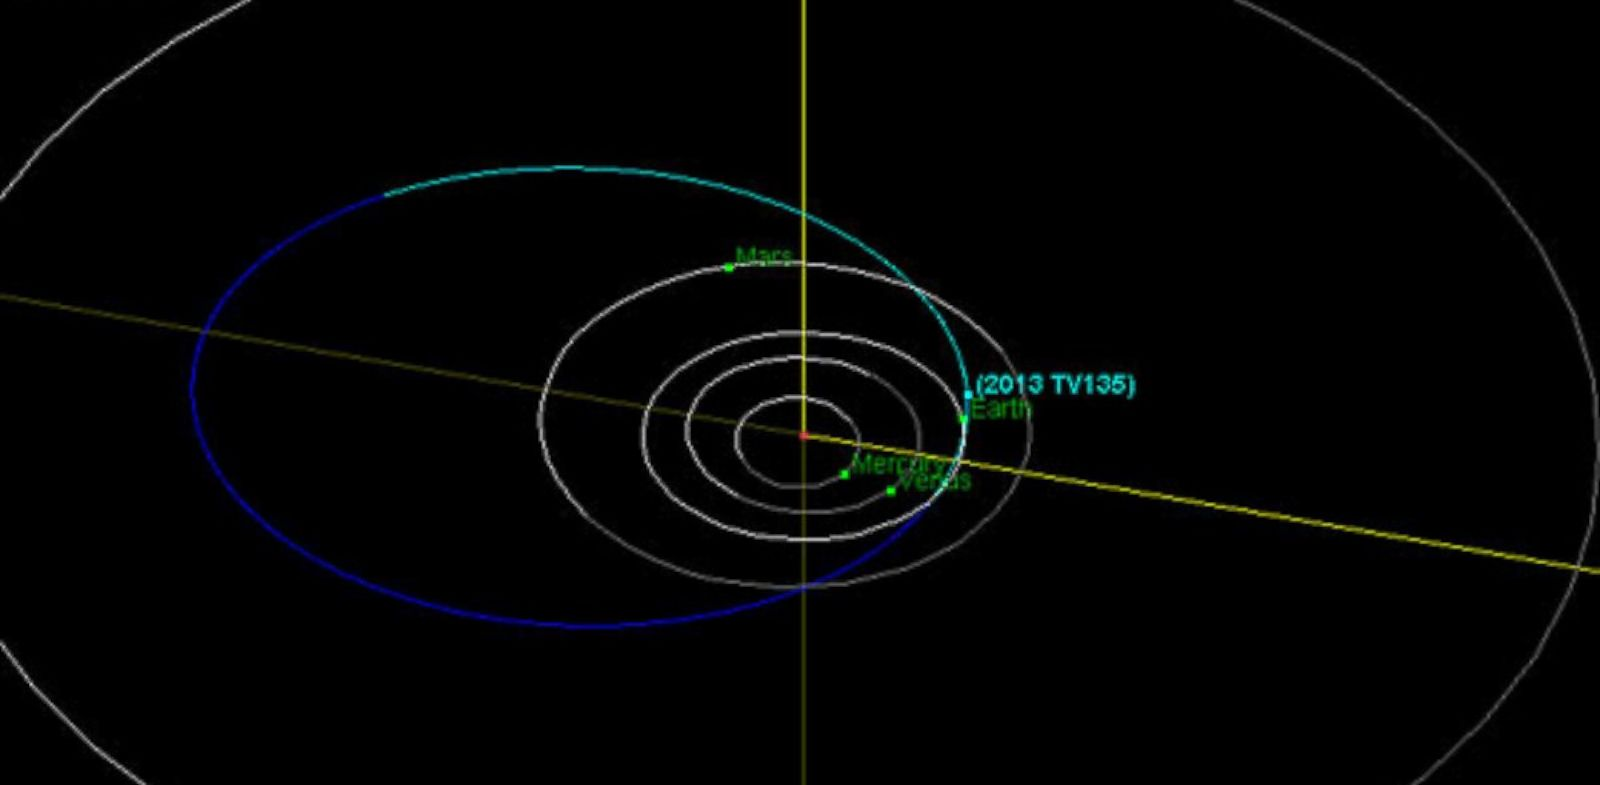 jpl nasa asteroid watch - photo #26